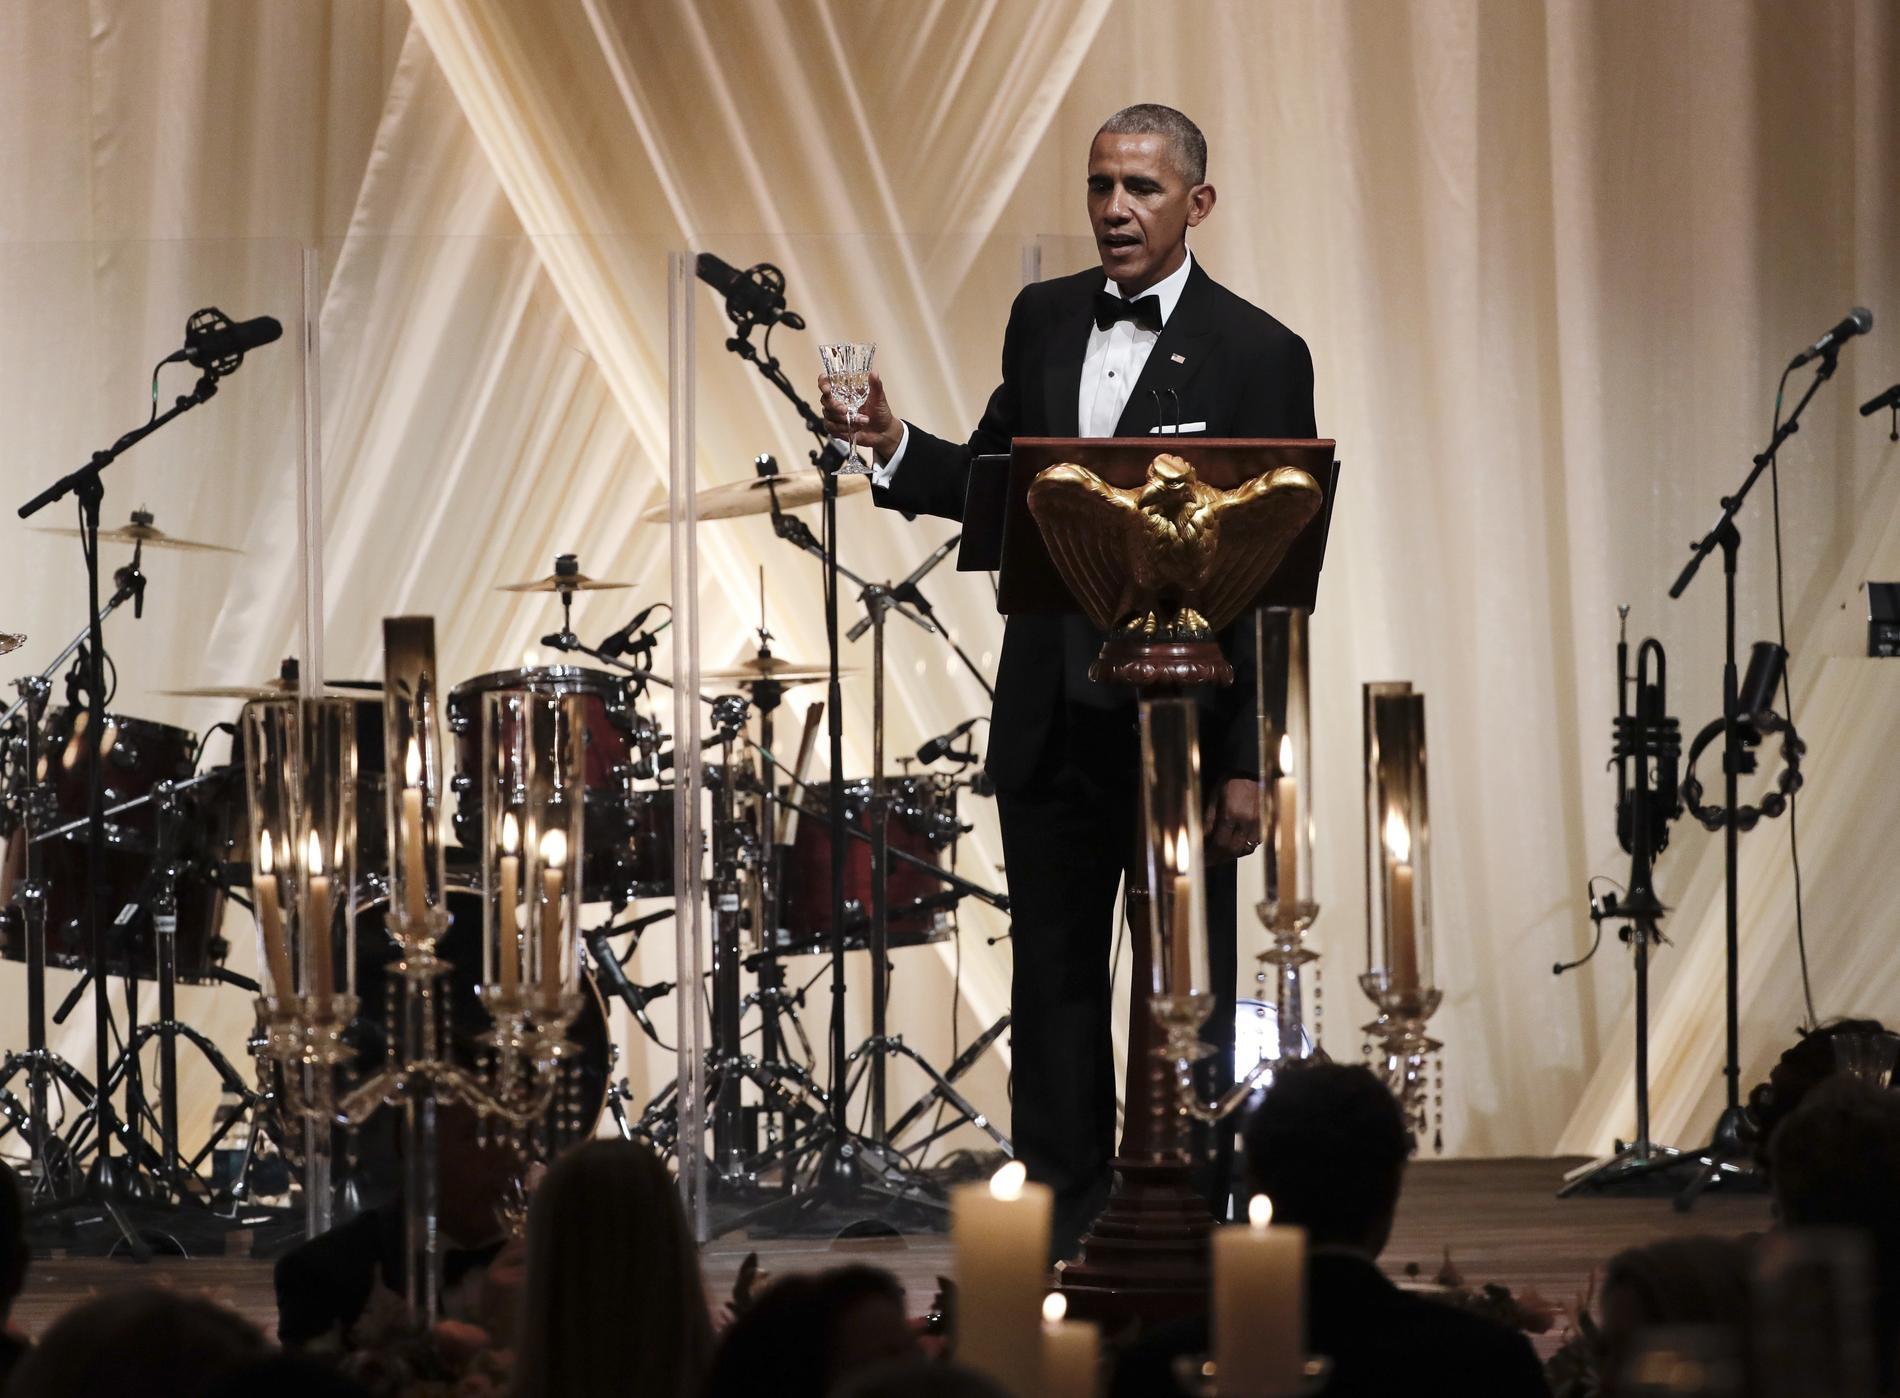 Michelle et barack obama leur dernier d ner d 39 tat la for Barack obama a la maison blanche